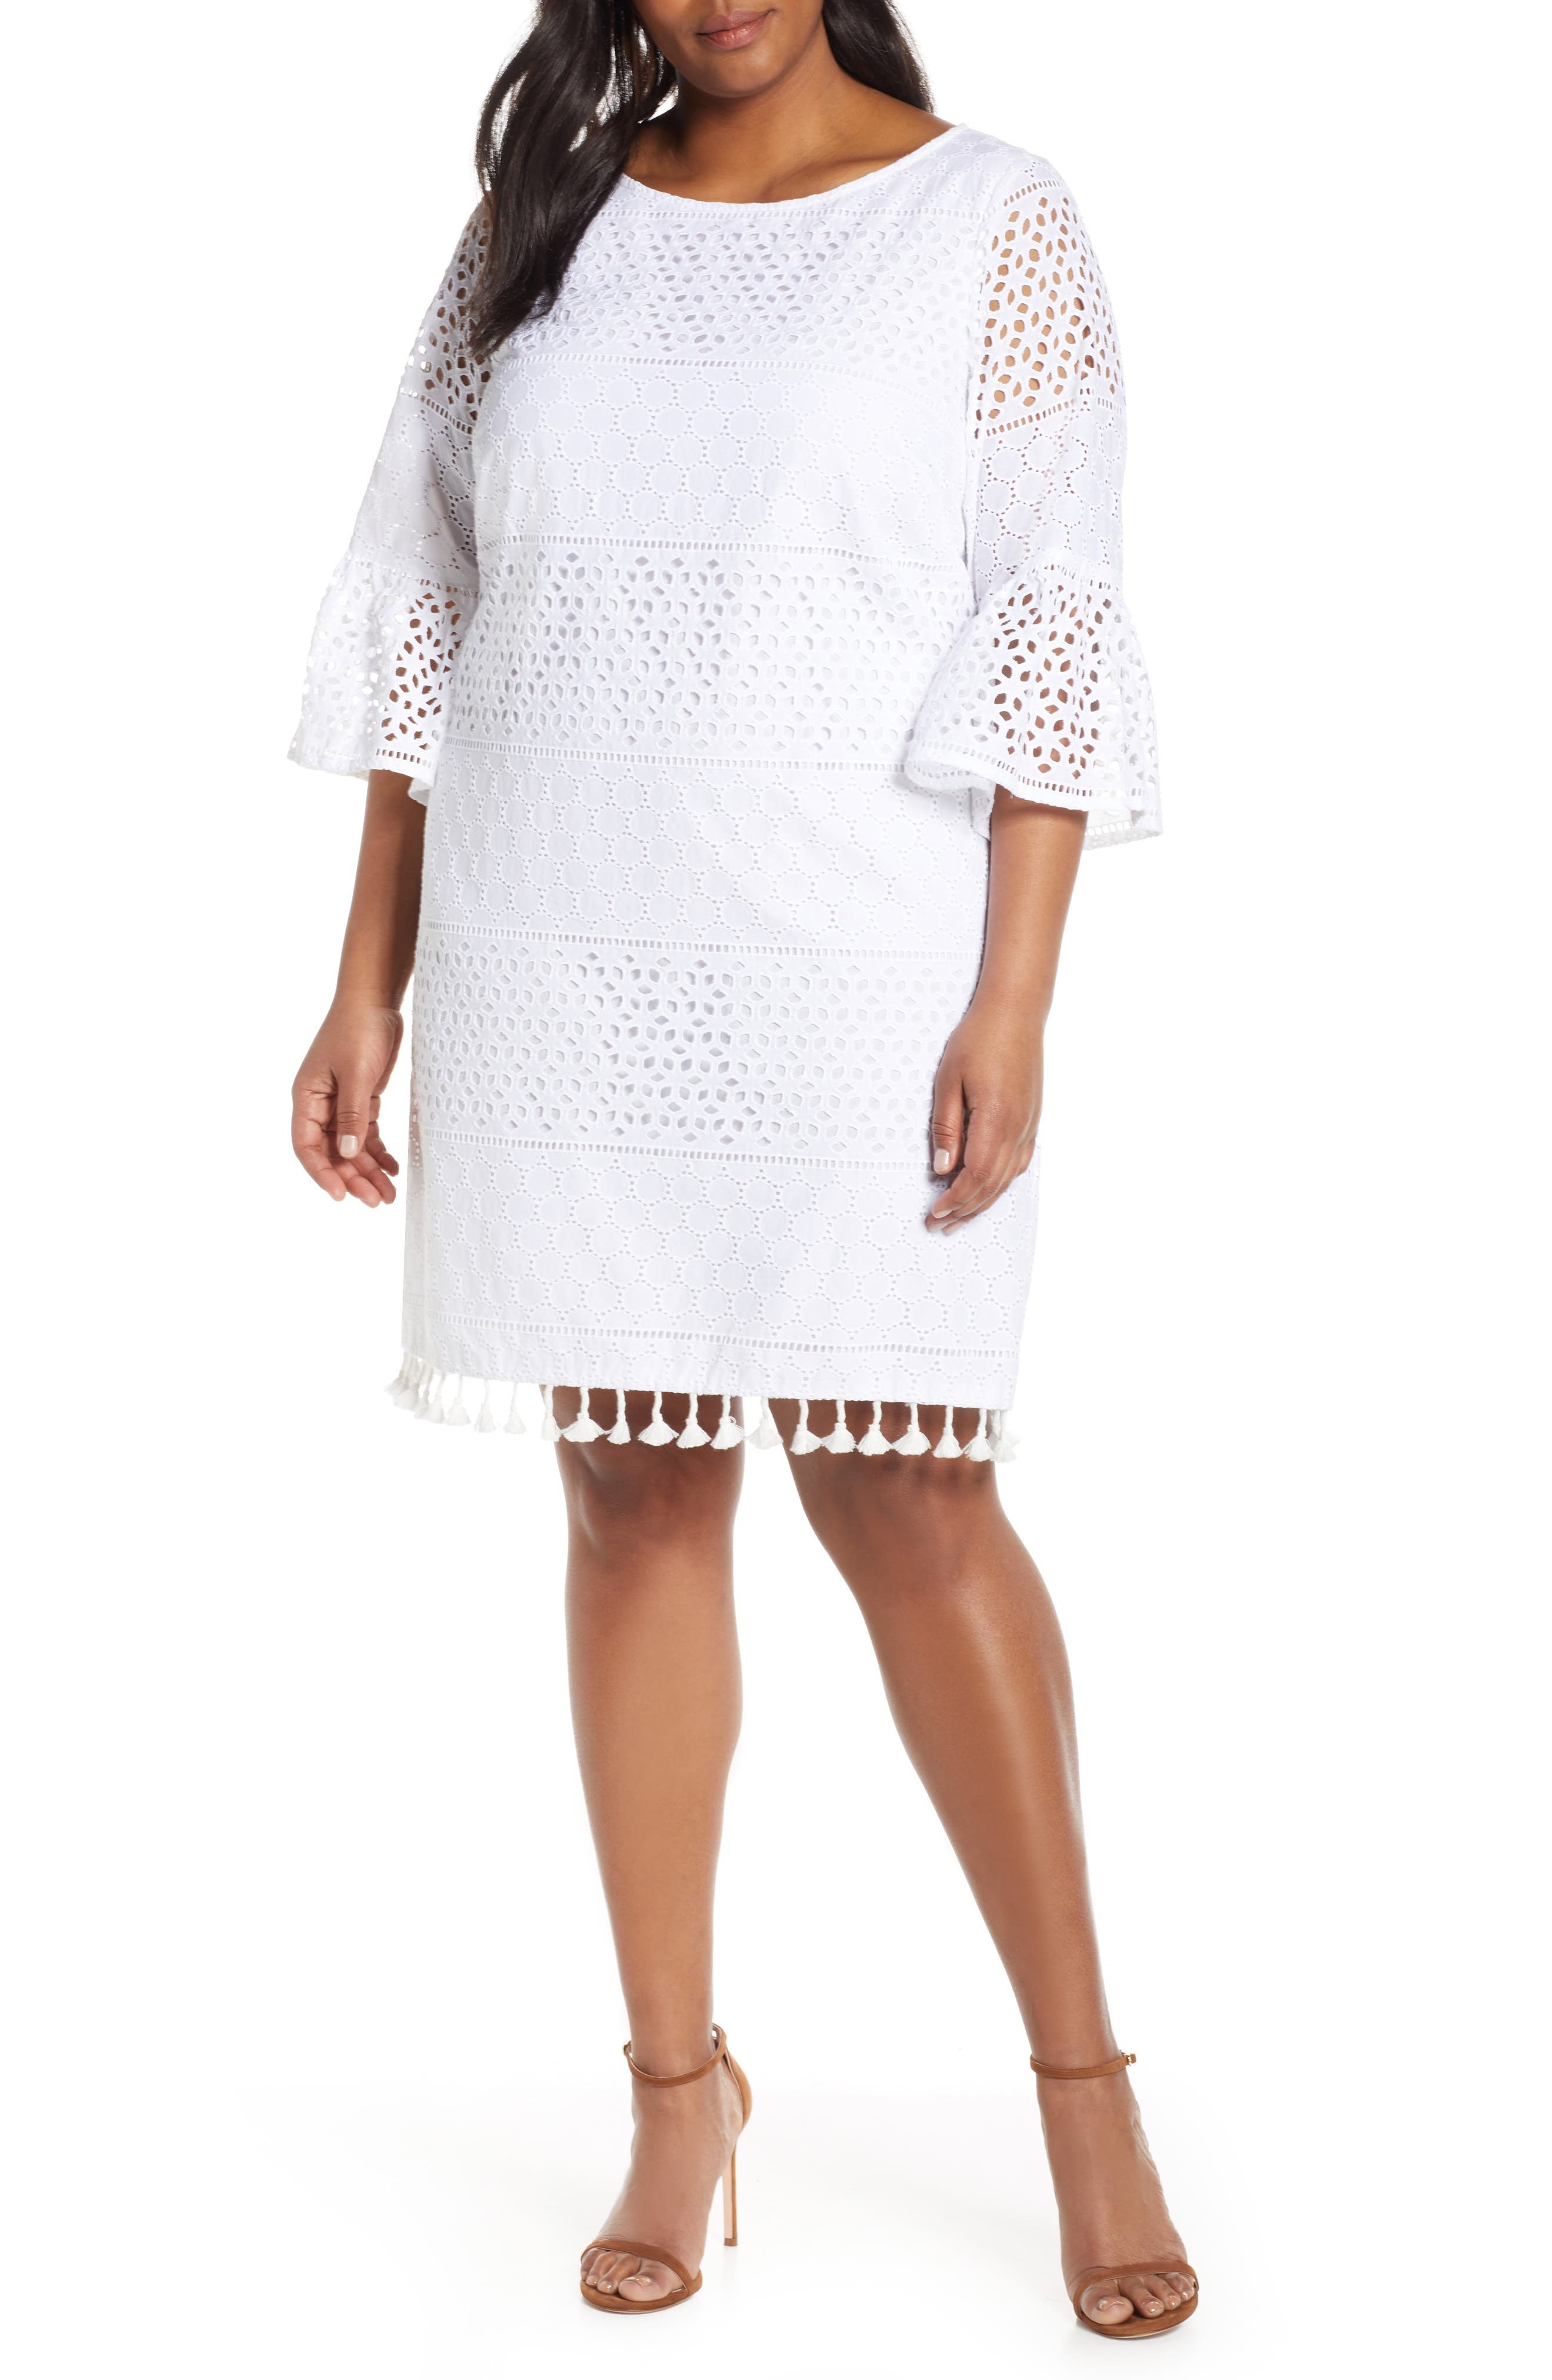 Plus Size Vince Camuto Eyelet Bell Sleeve Shift Dress With Tassel Hem, Ivory